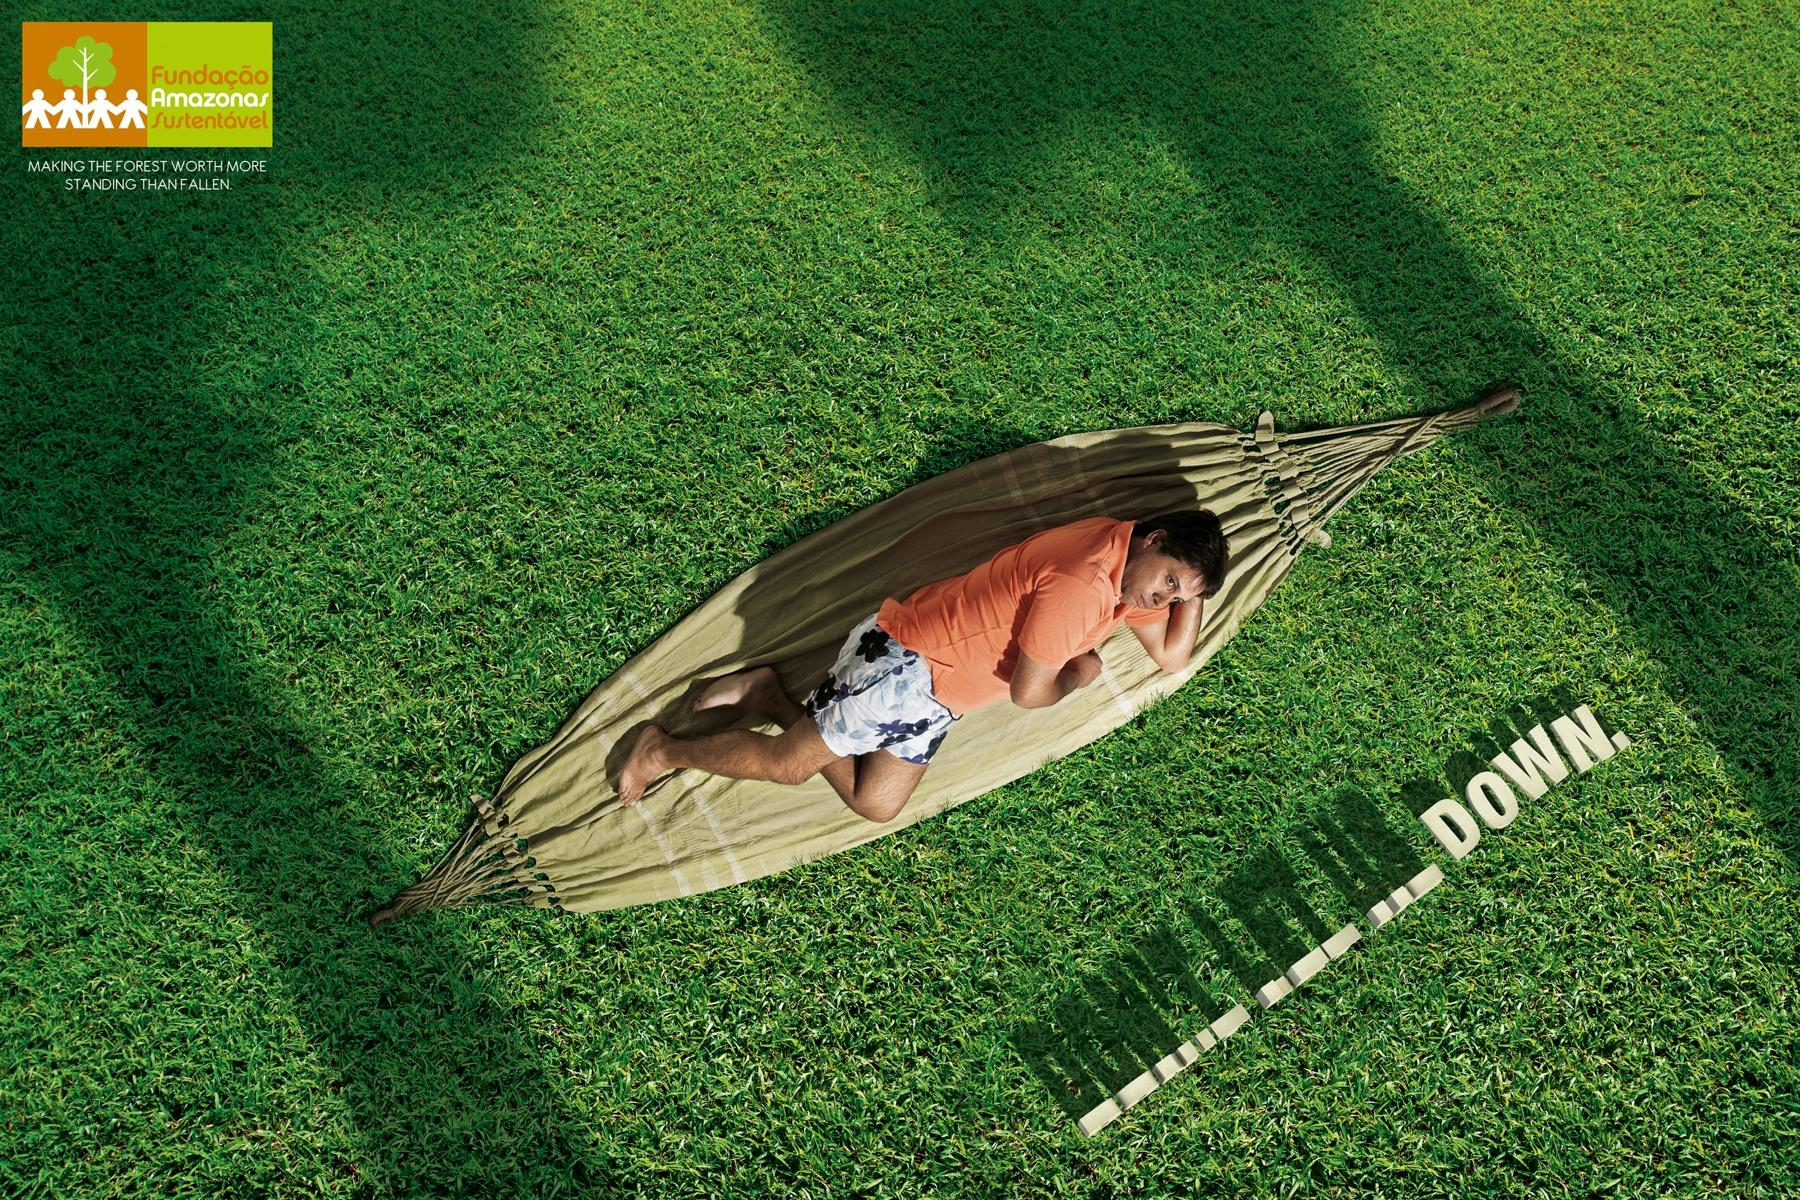 Fundação Amazonas Sustentável Print Ad -  Hammock